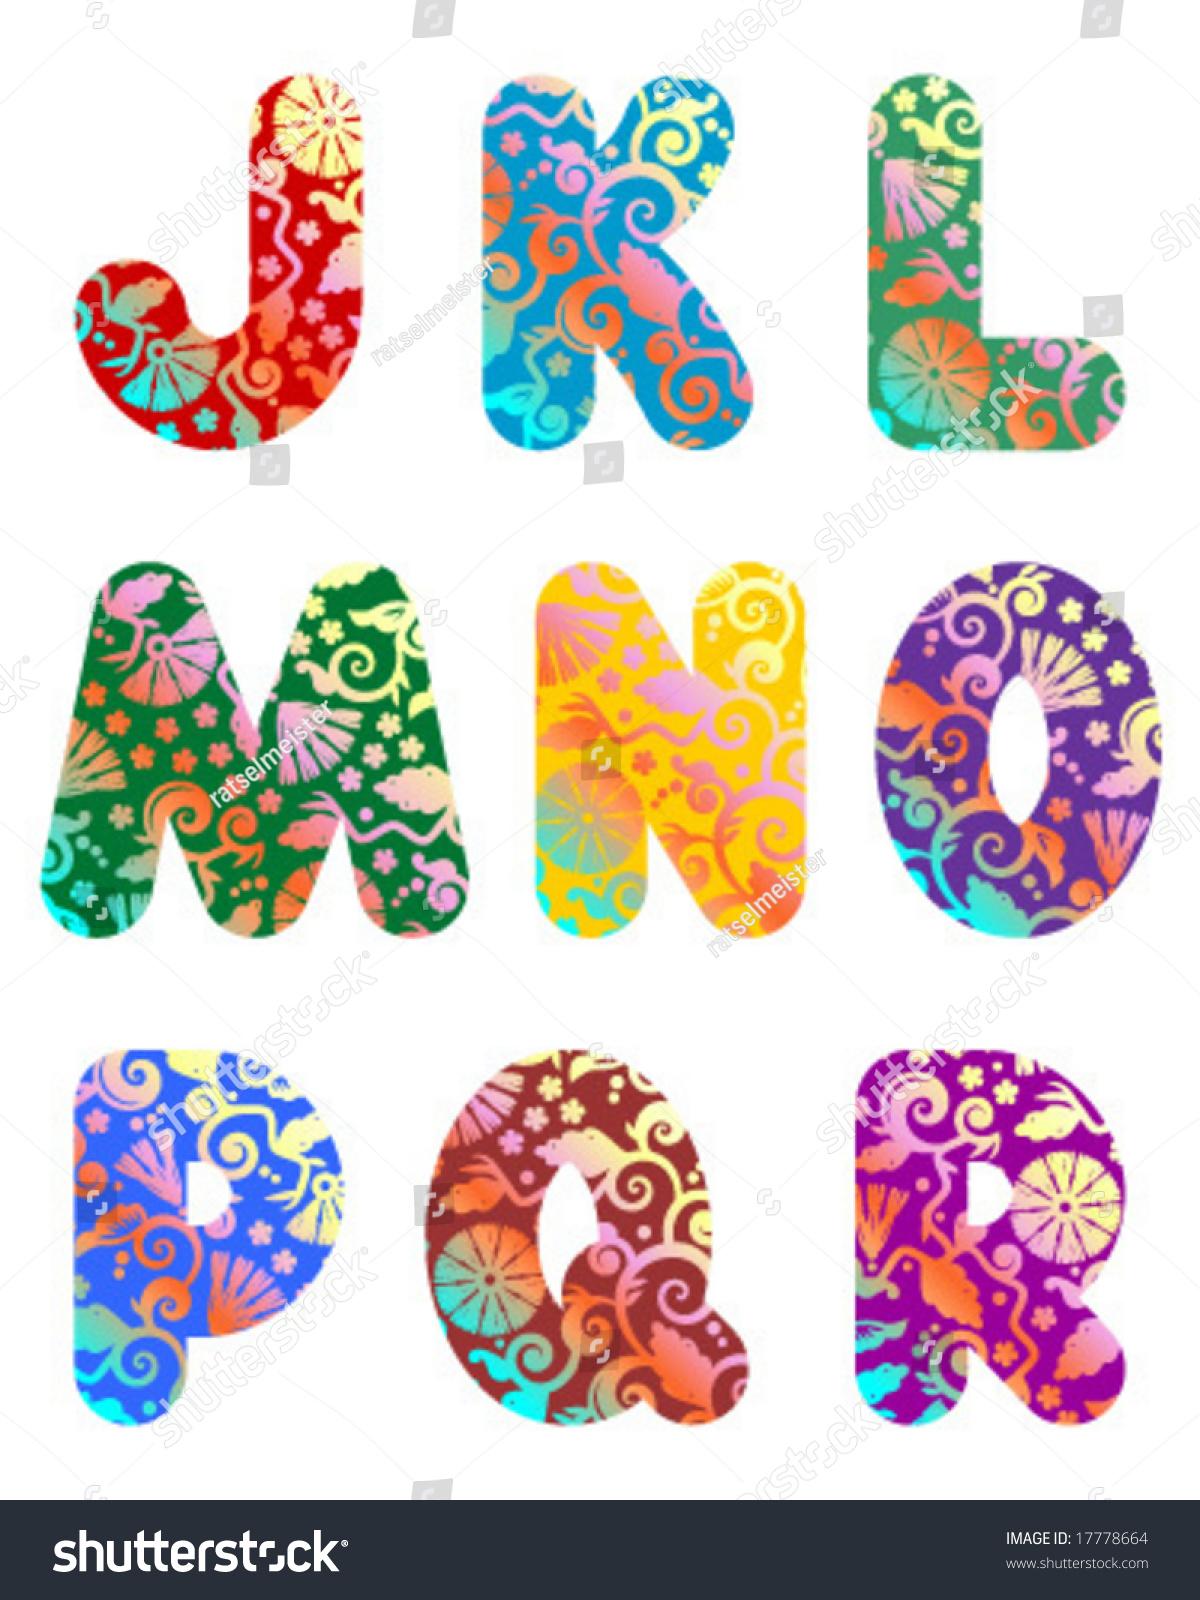 Decorative Letters Ornate Decorative Letters J K L Stock Vector 17778664 Shutterstock